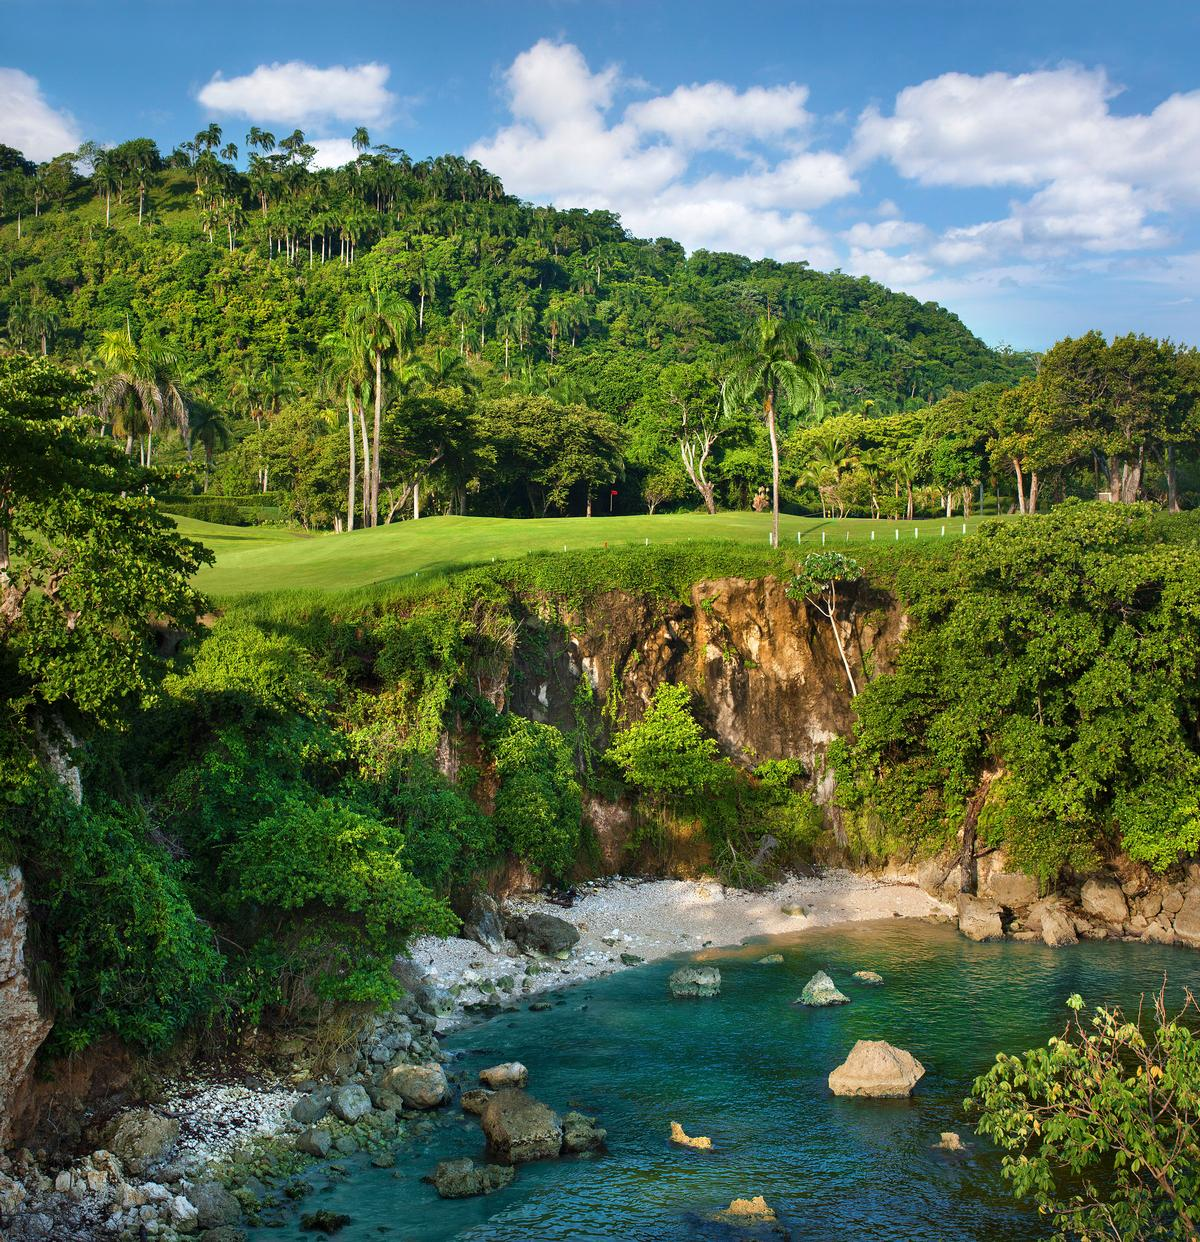 The Playa Grande Golf Course, originally designed by architect Robert Trent Jones, Sr., has been revived by Jones' son, Rees Jones / Aman